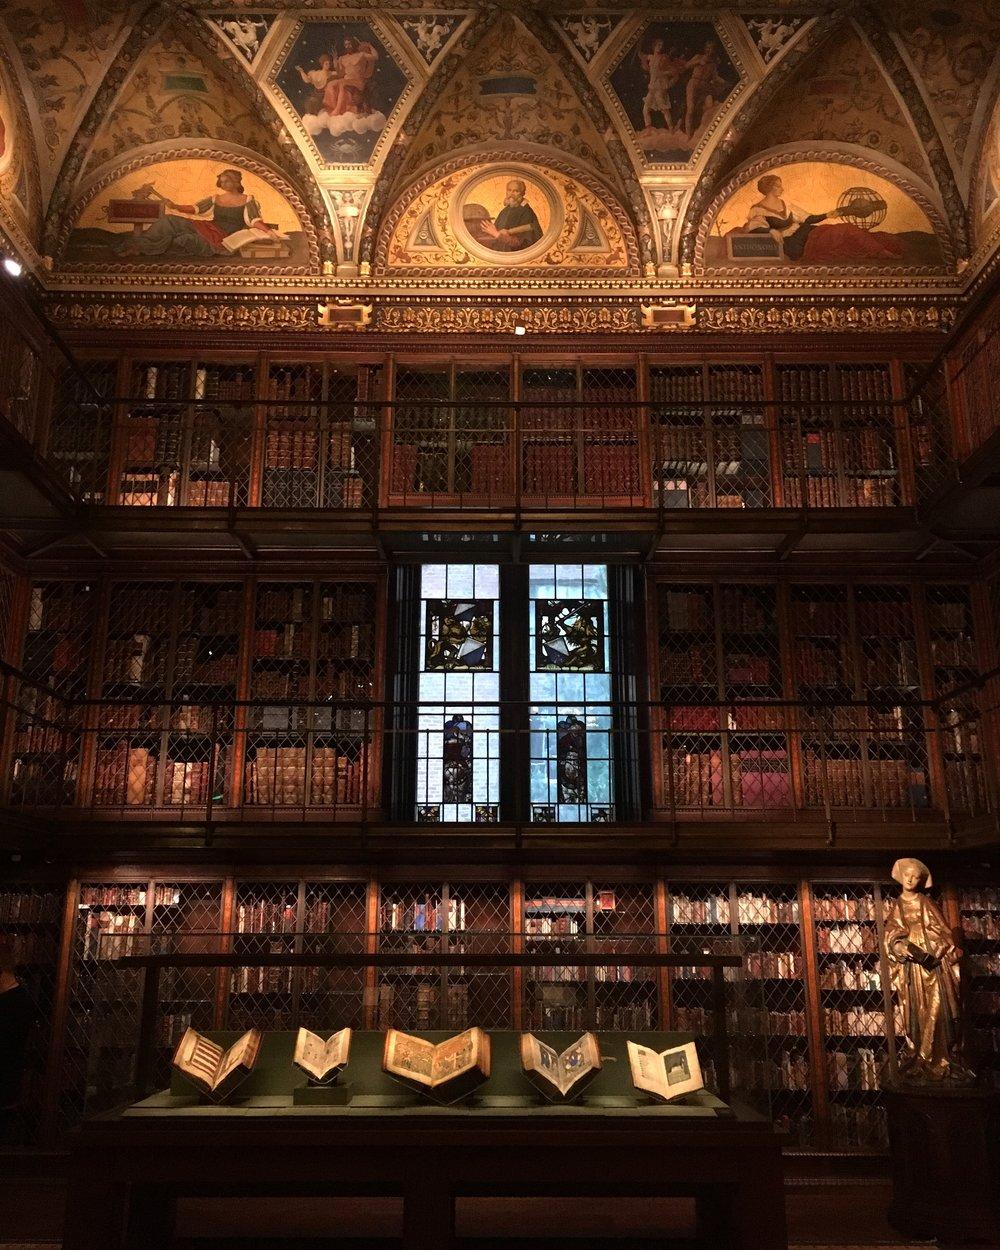 Mr. Morgan's Library at the Morgan Library & Museum, New York City.